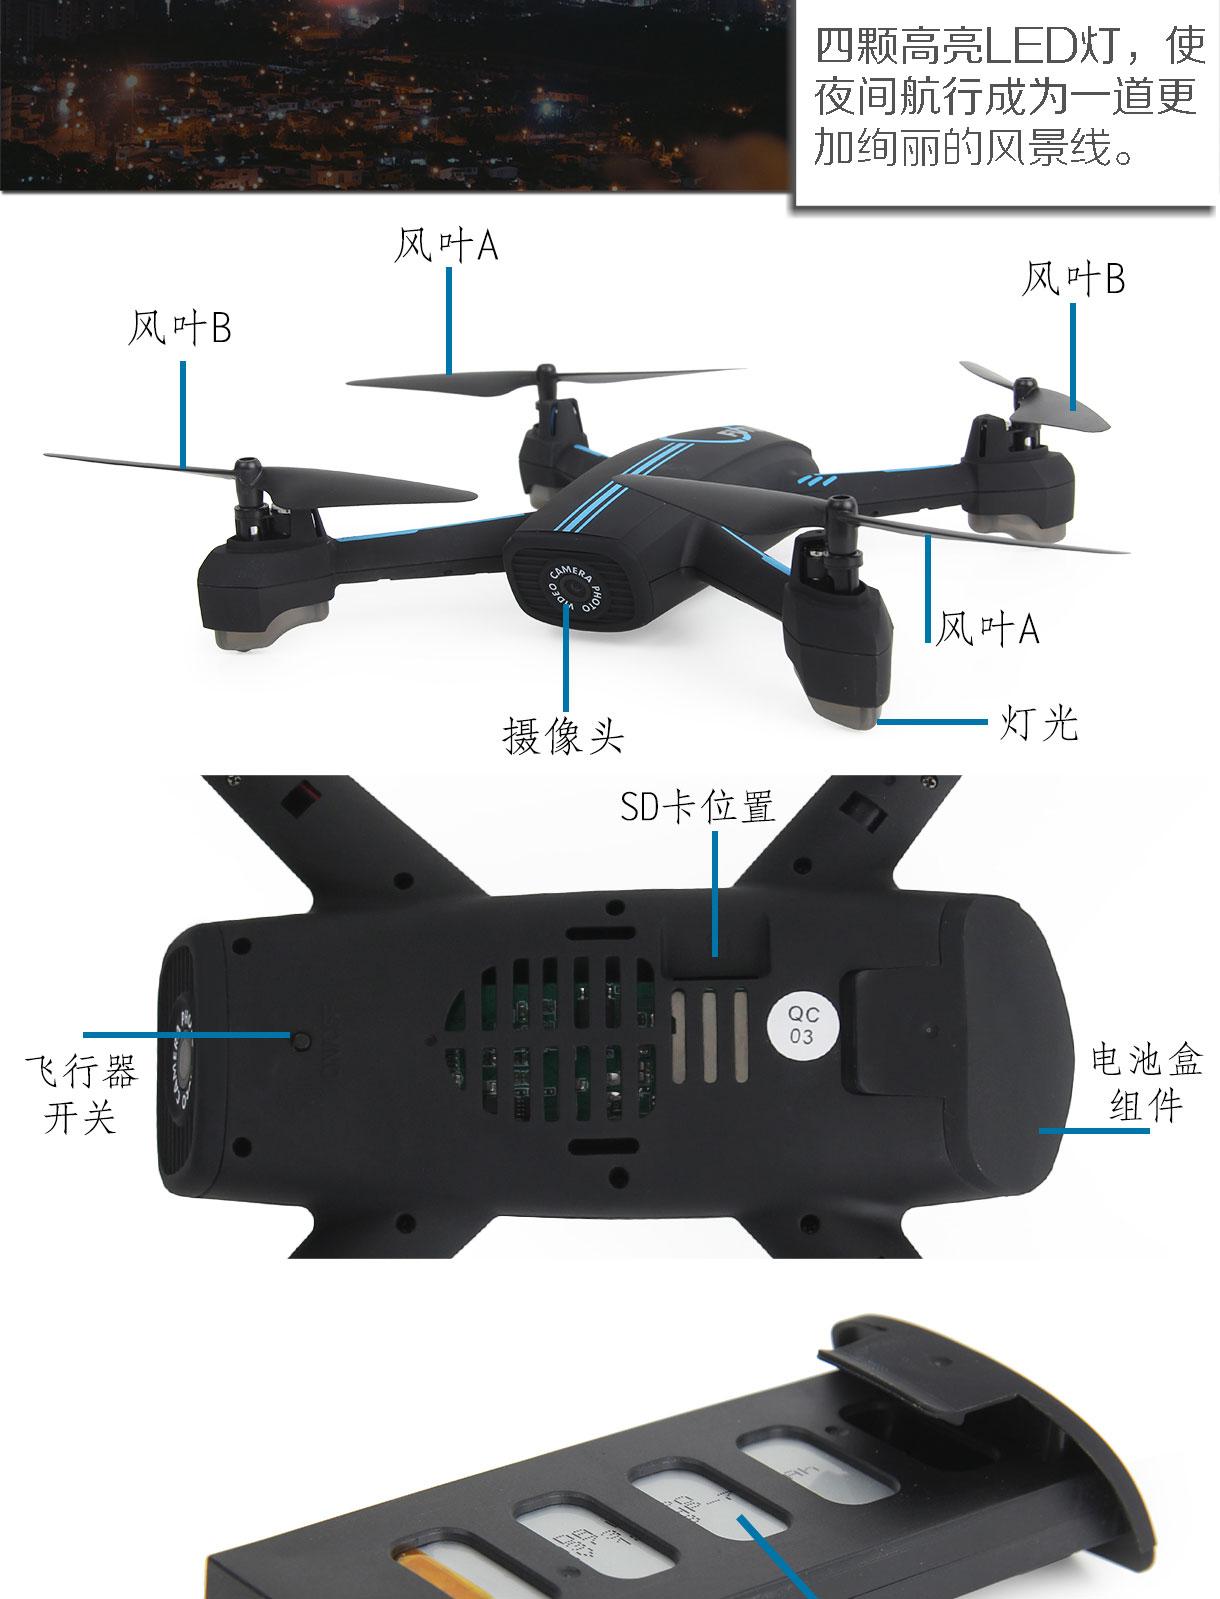 WIFI FPV RC Drone GPS Bergbau Punkt Drone 528 RC Quadcopter Volle HD 720P Kamera ein schlüssel nehmen off /landung/stop Stabile Flug - 6